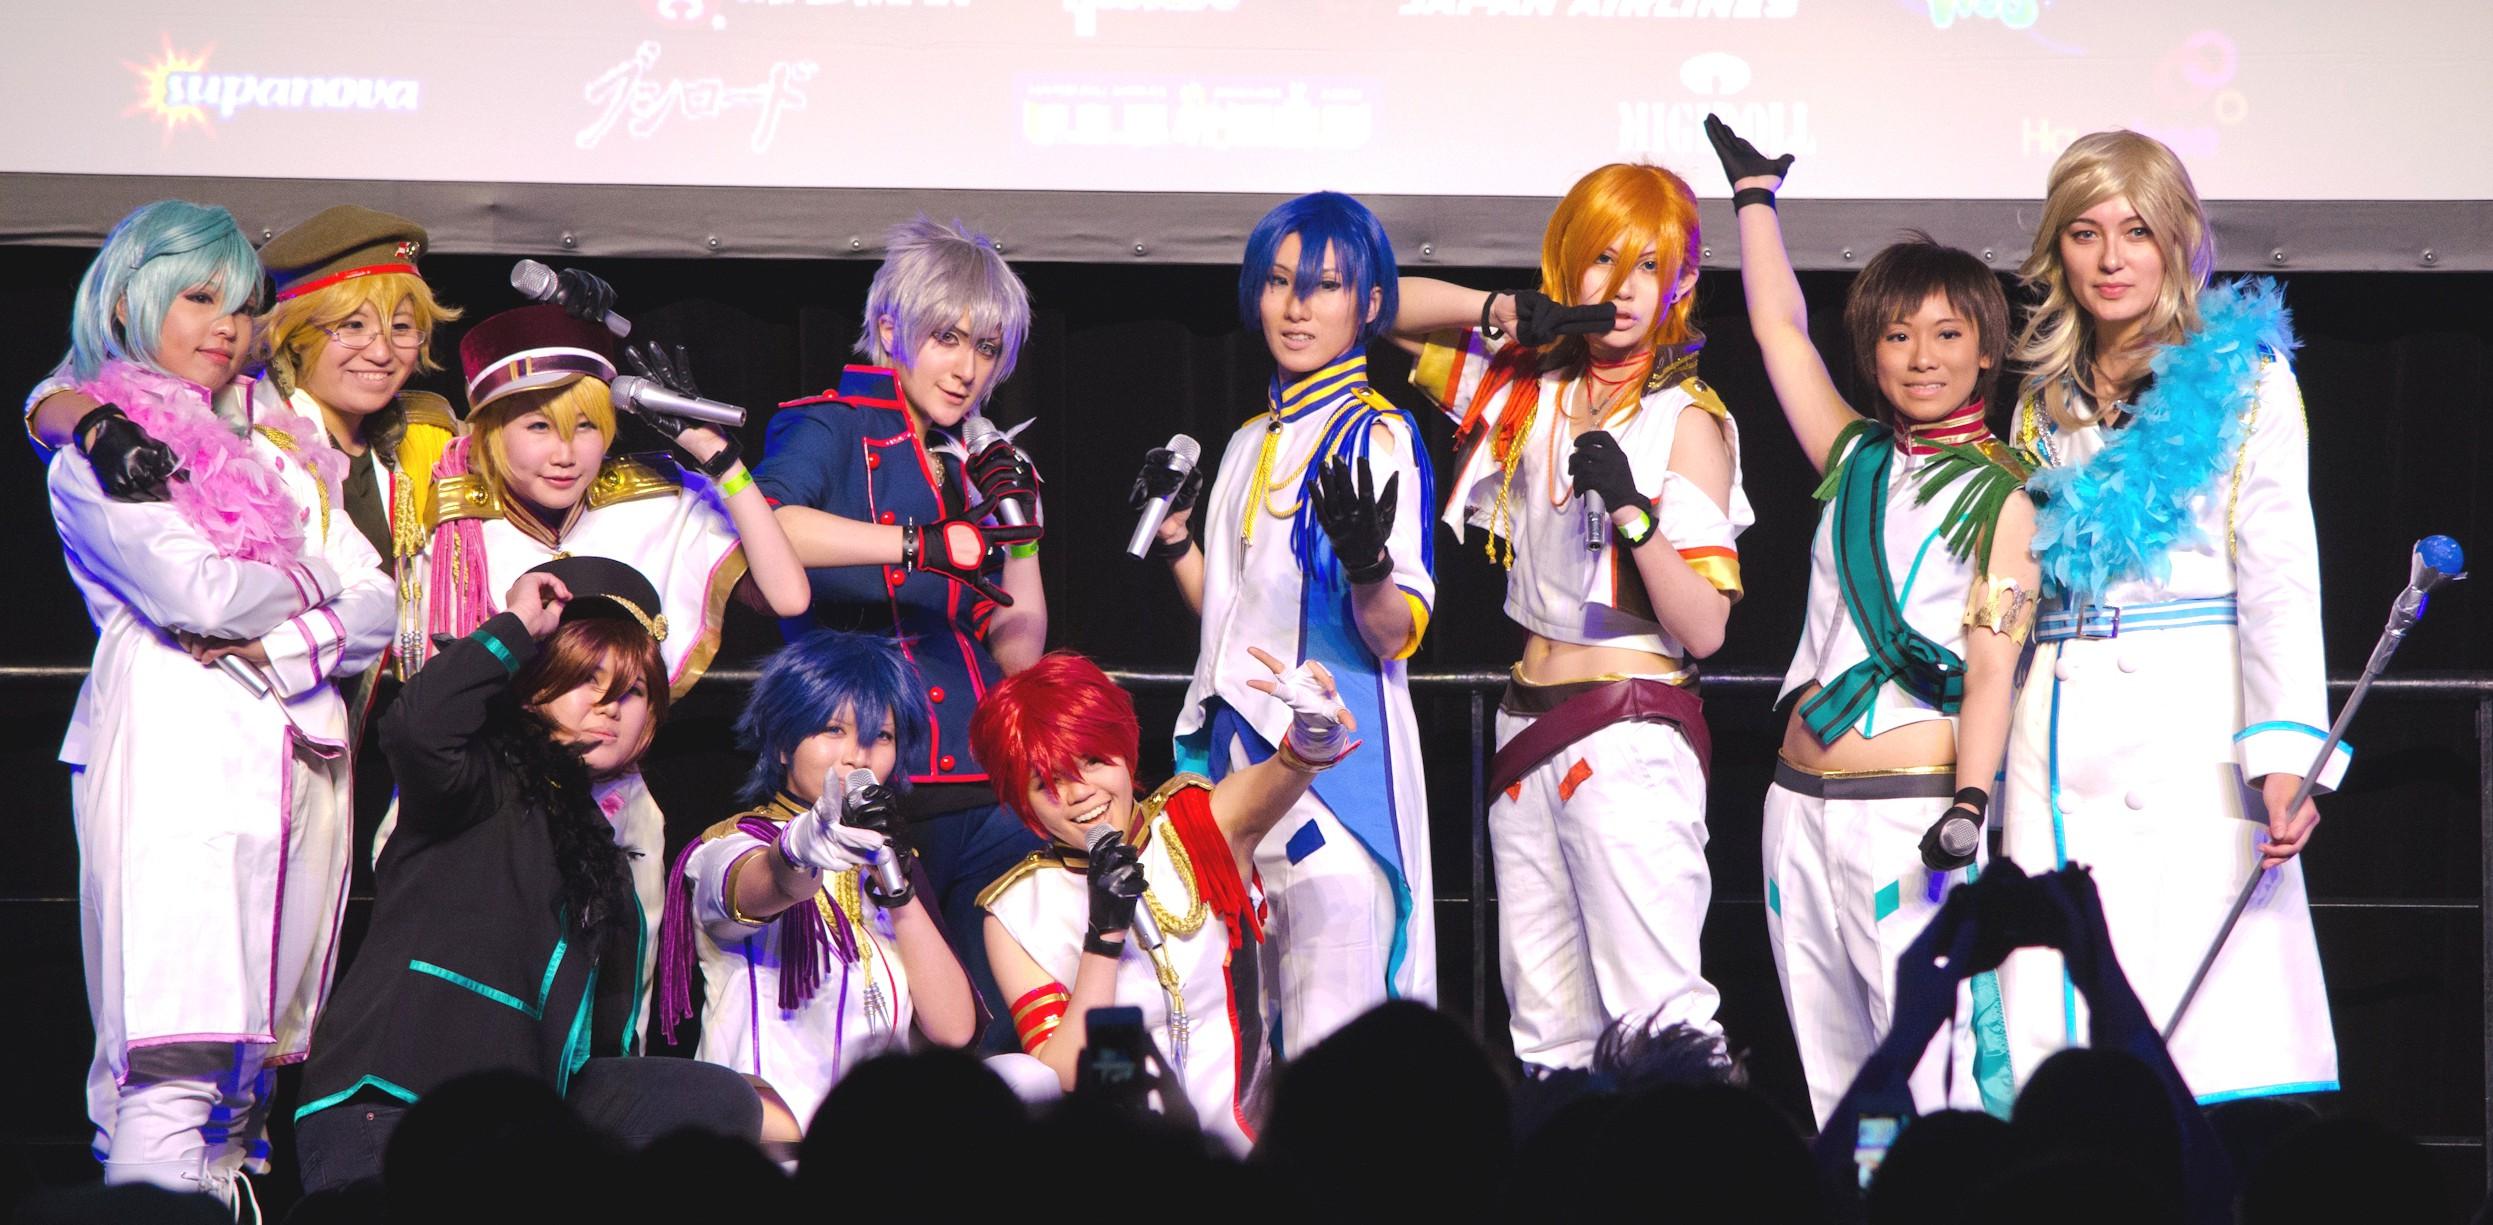 2014 cosplaygroup_smashcon